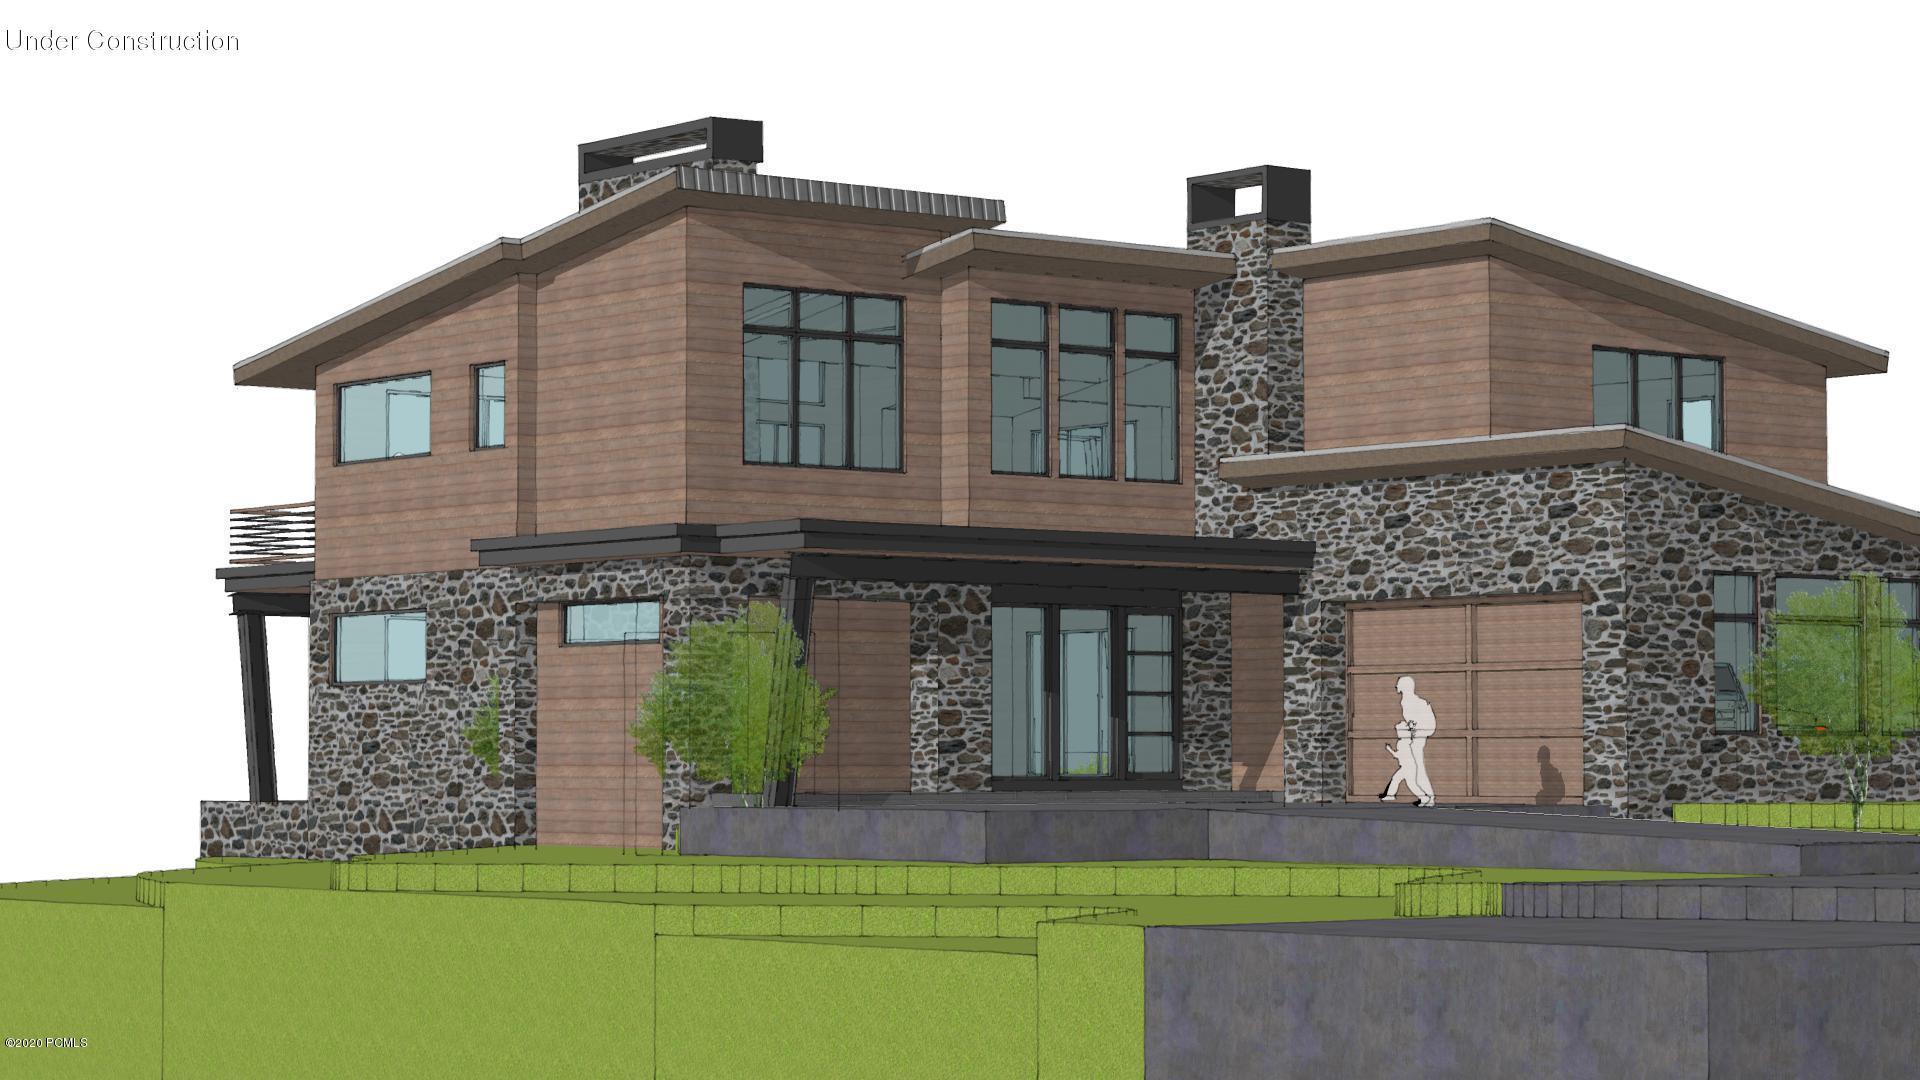 1461 Ursa Way, Heber City, Utah 84032, 4 Bedrooms Bedrooms, ,4 BathroomsBathrooms,Single Family,For Sale,Ursa,12004146